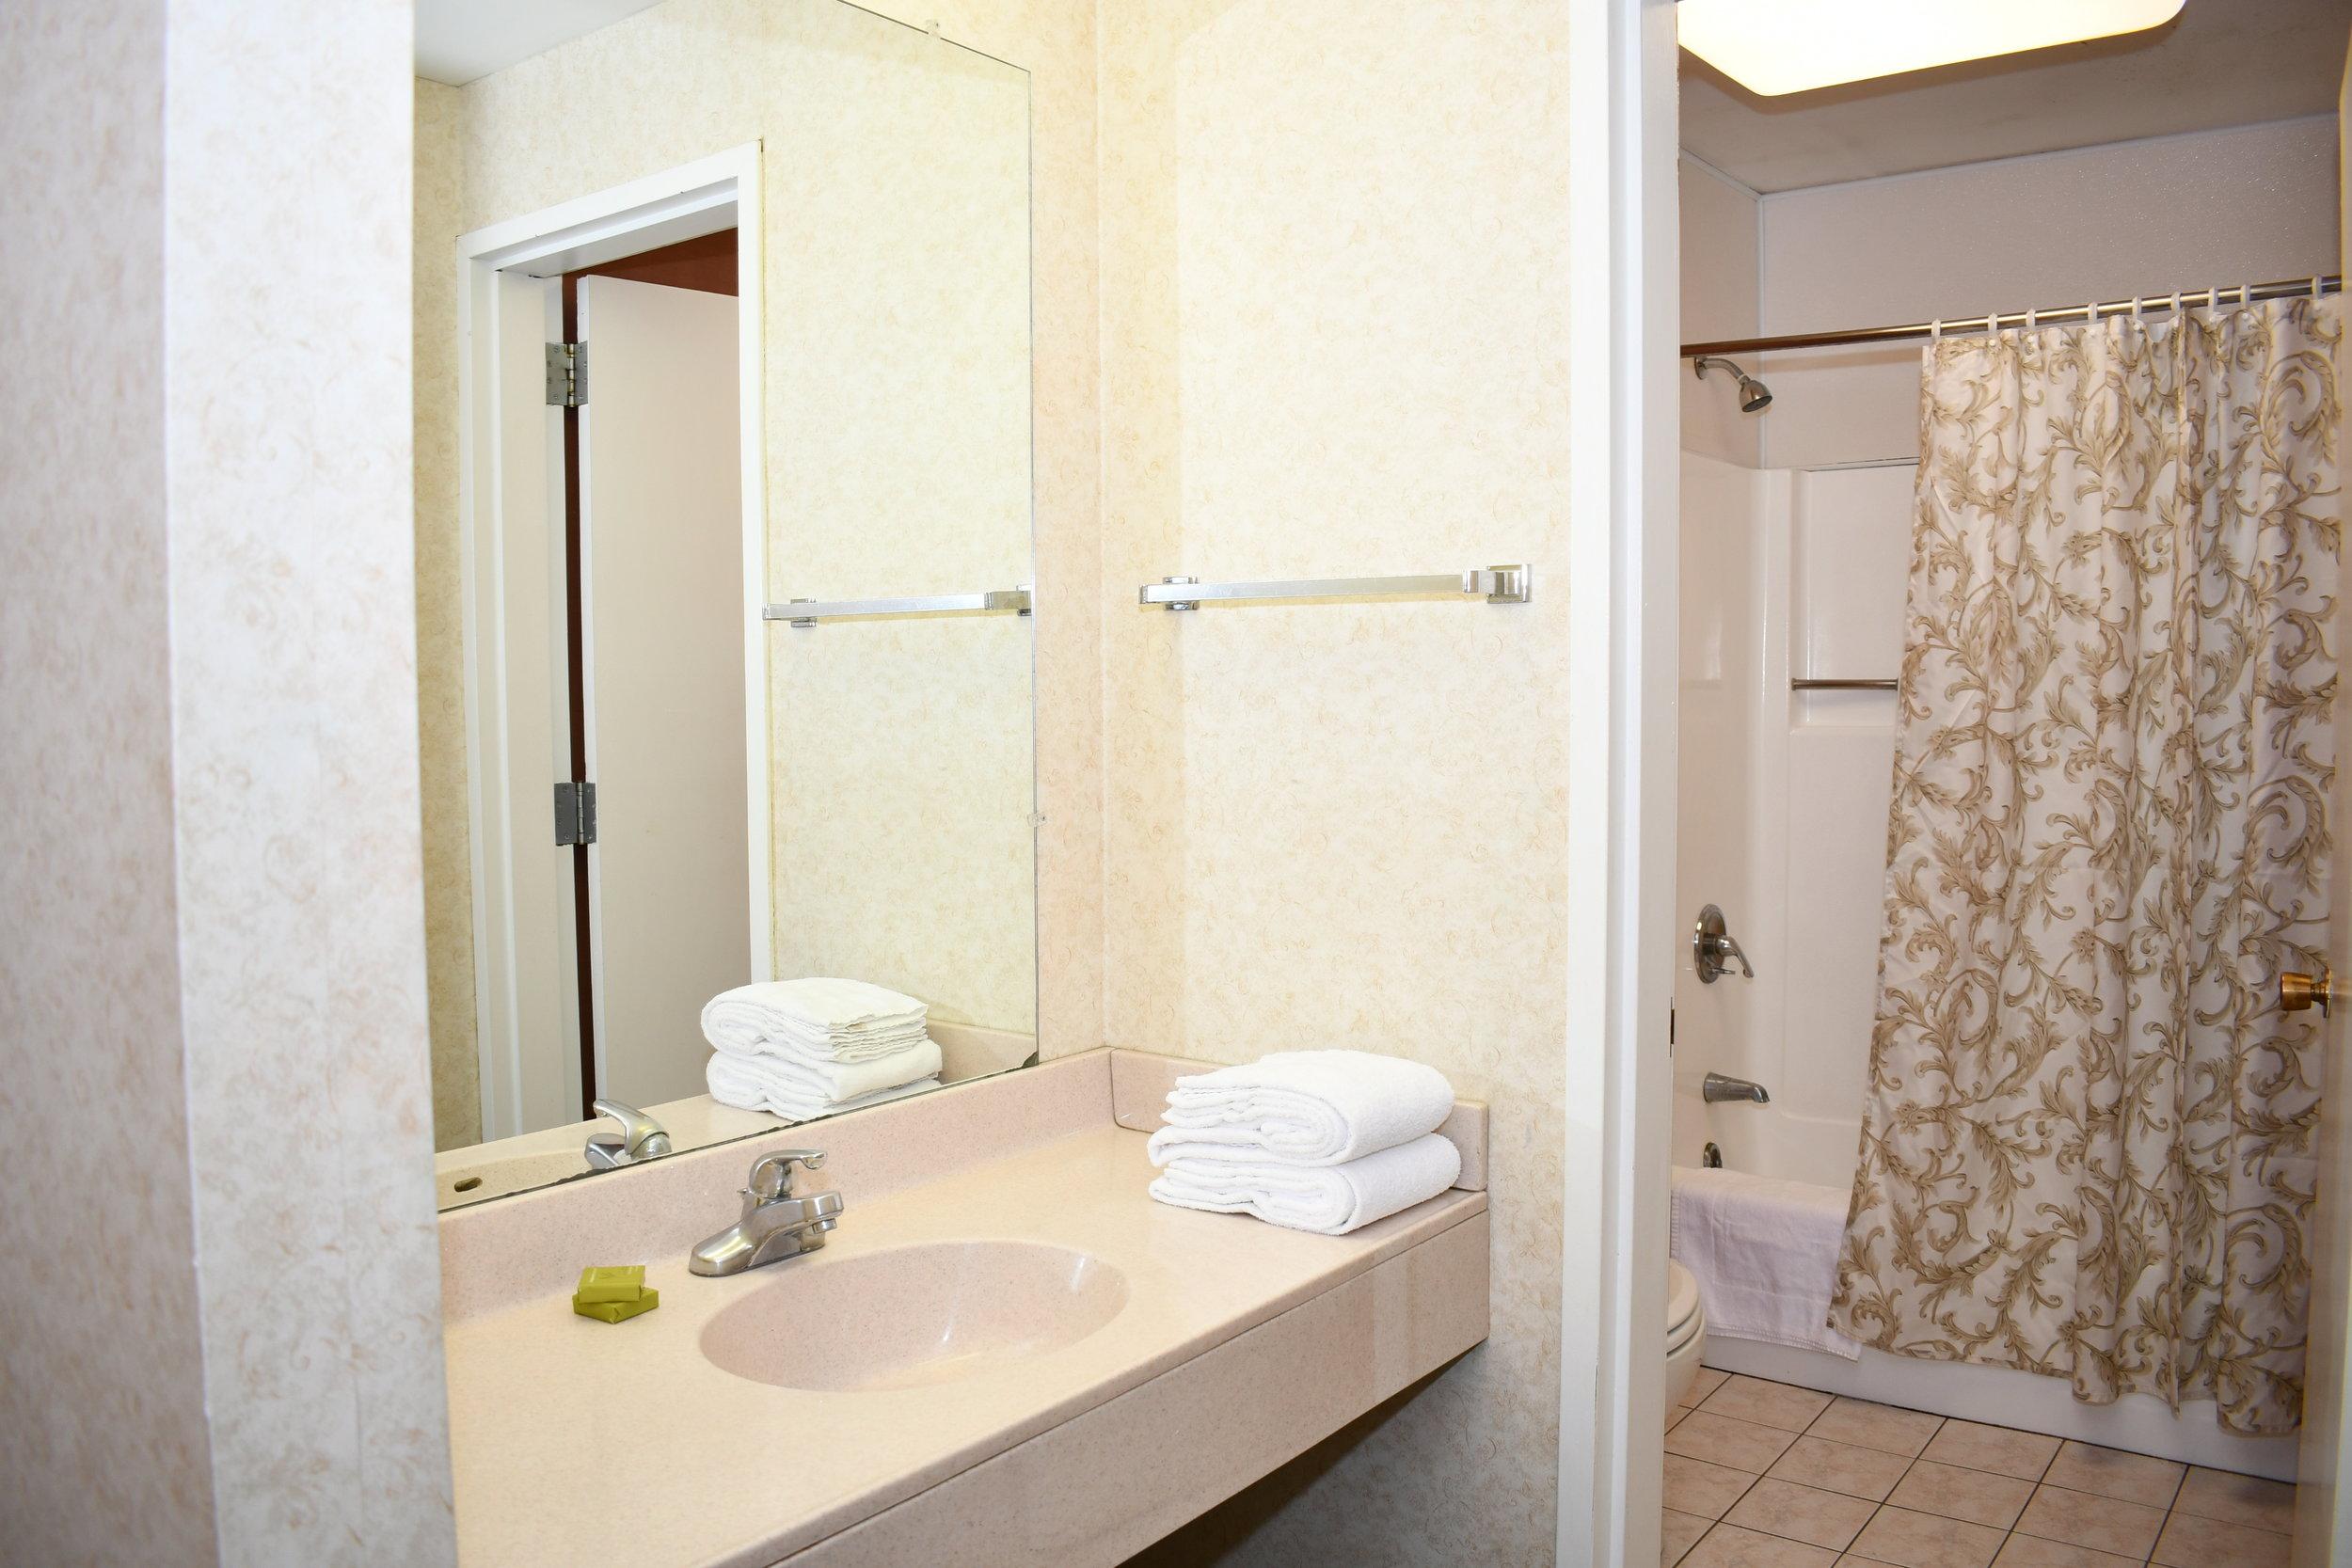 Hillside room bathroom